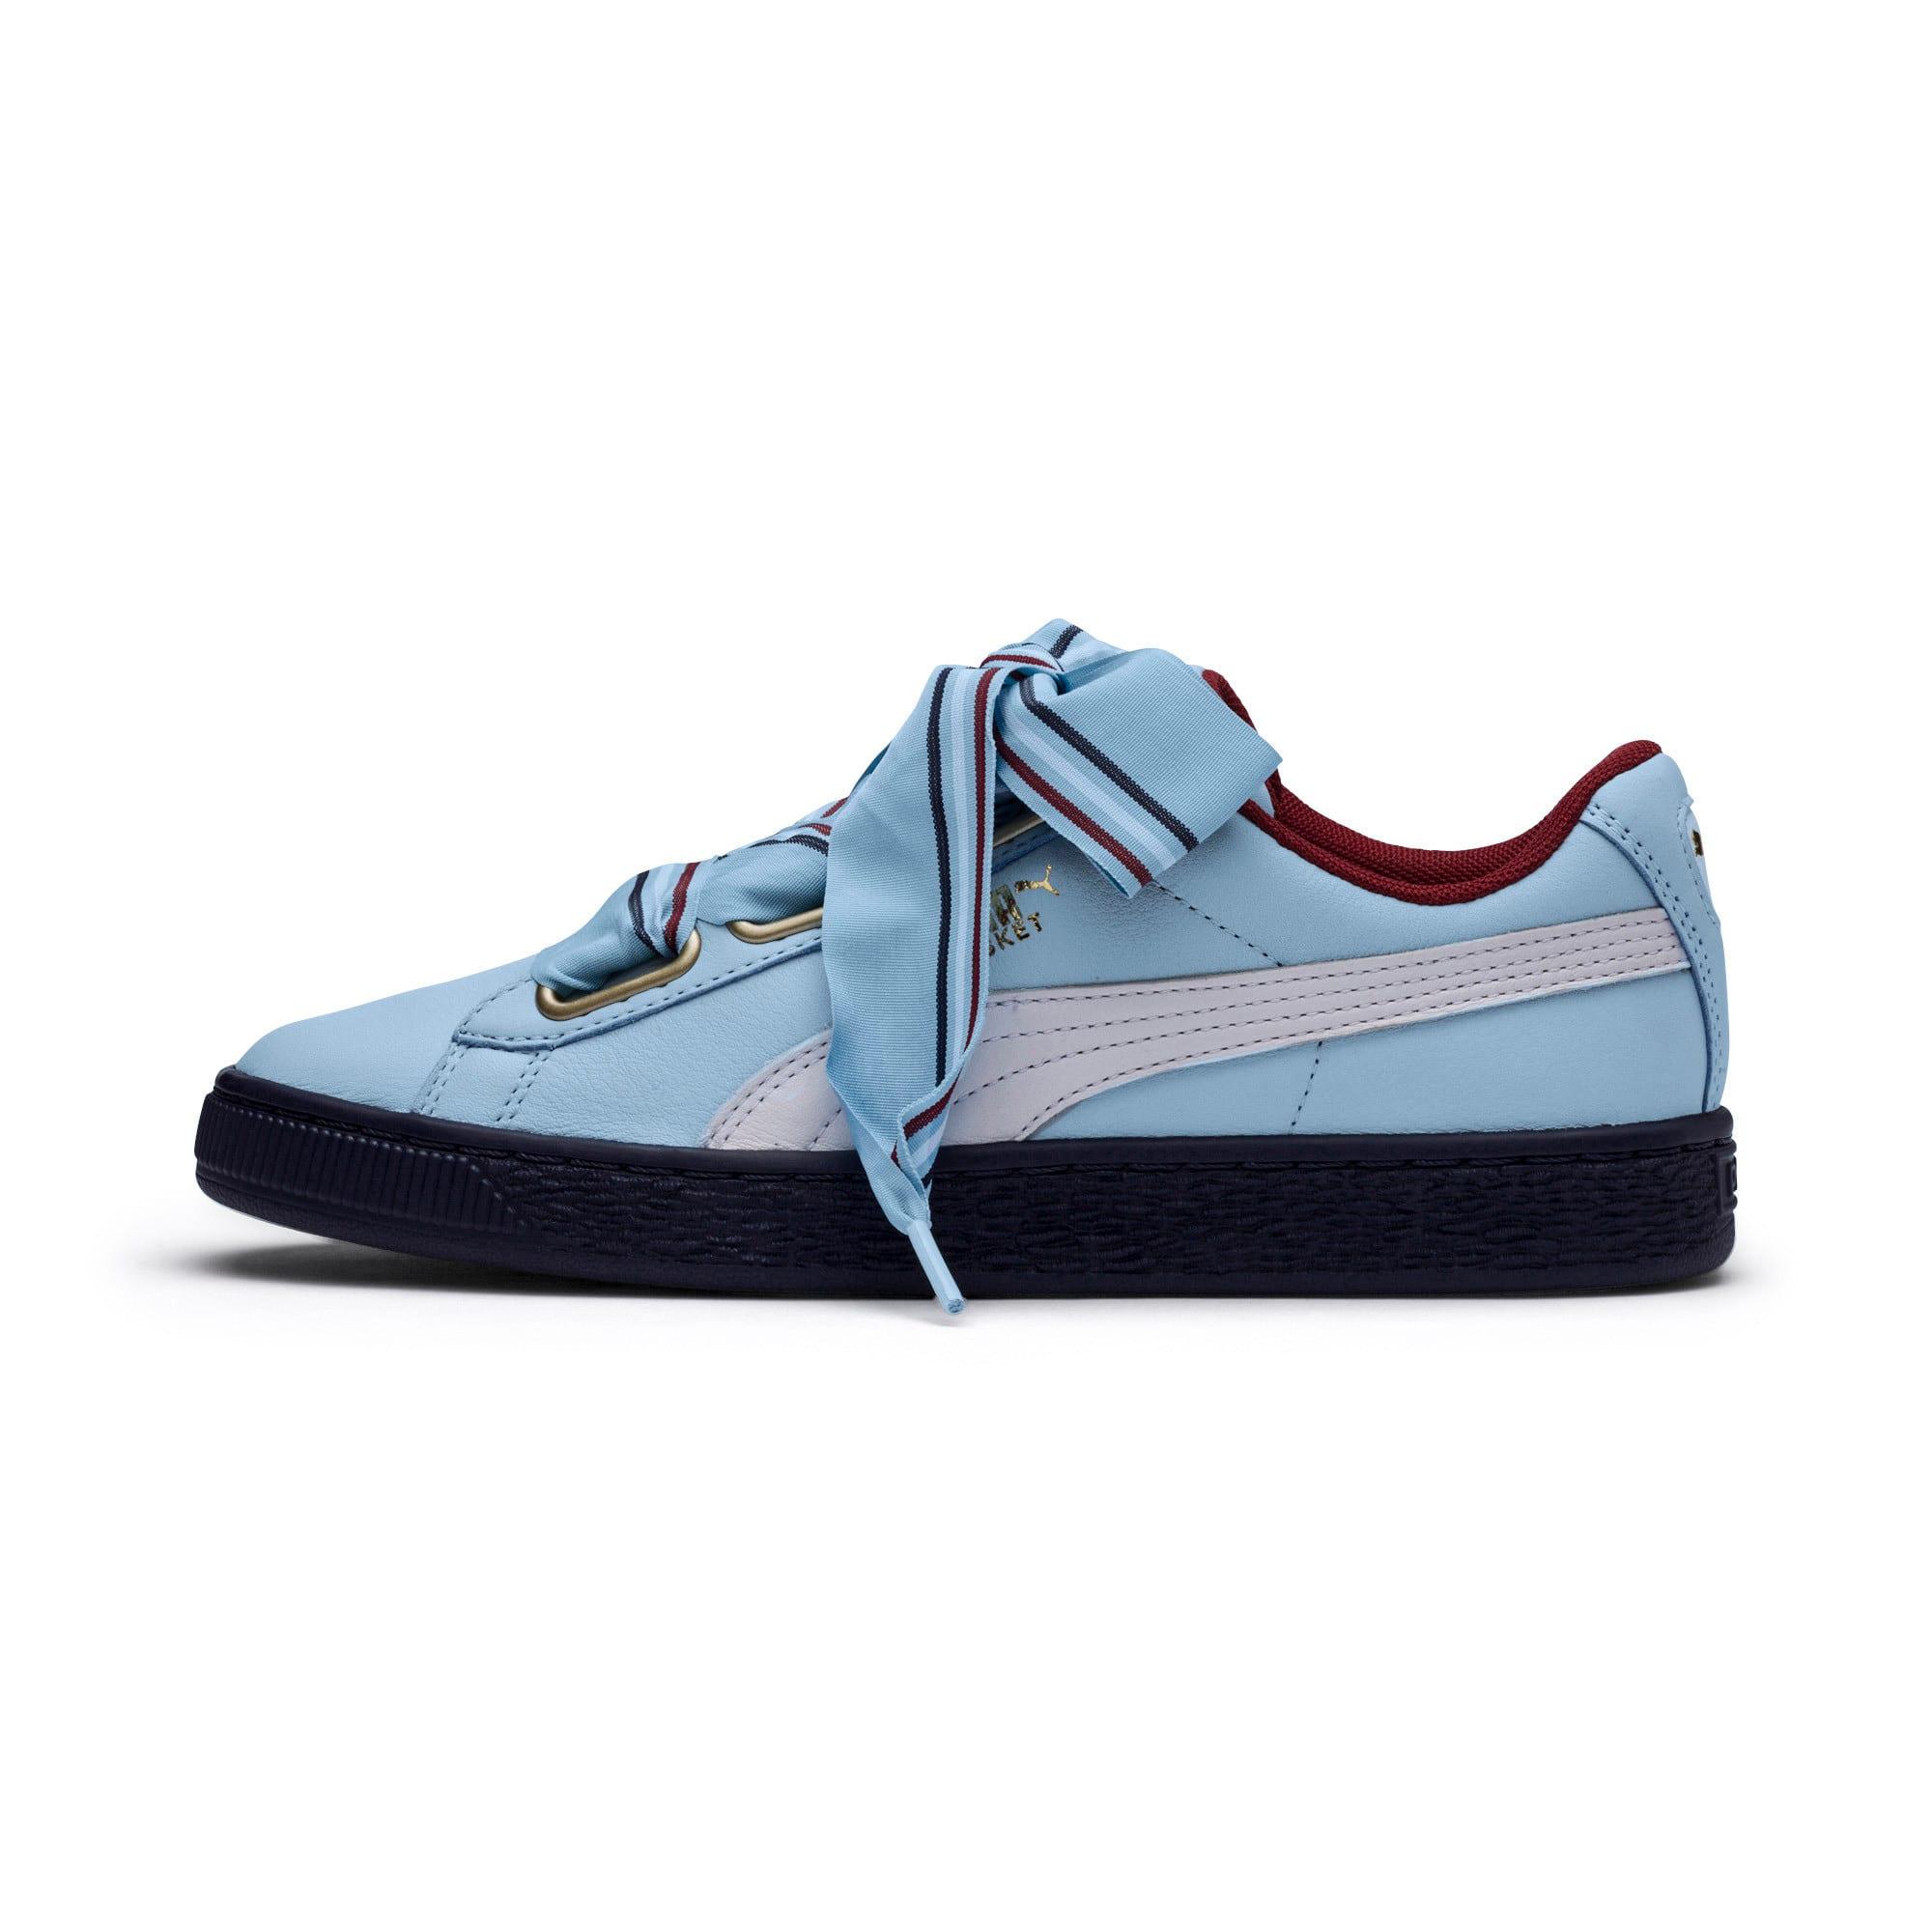 Thumbnail 1 of Basket Heart New School Women's Sneakers, CERULEAN-CERULEAN, medium